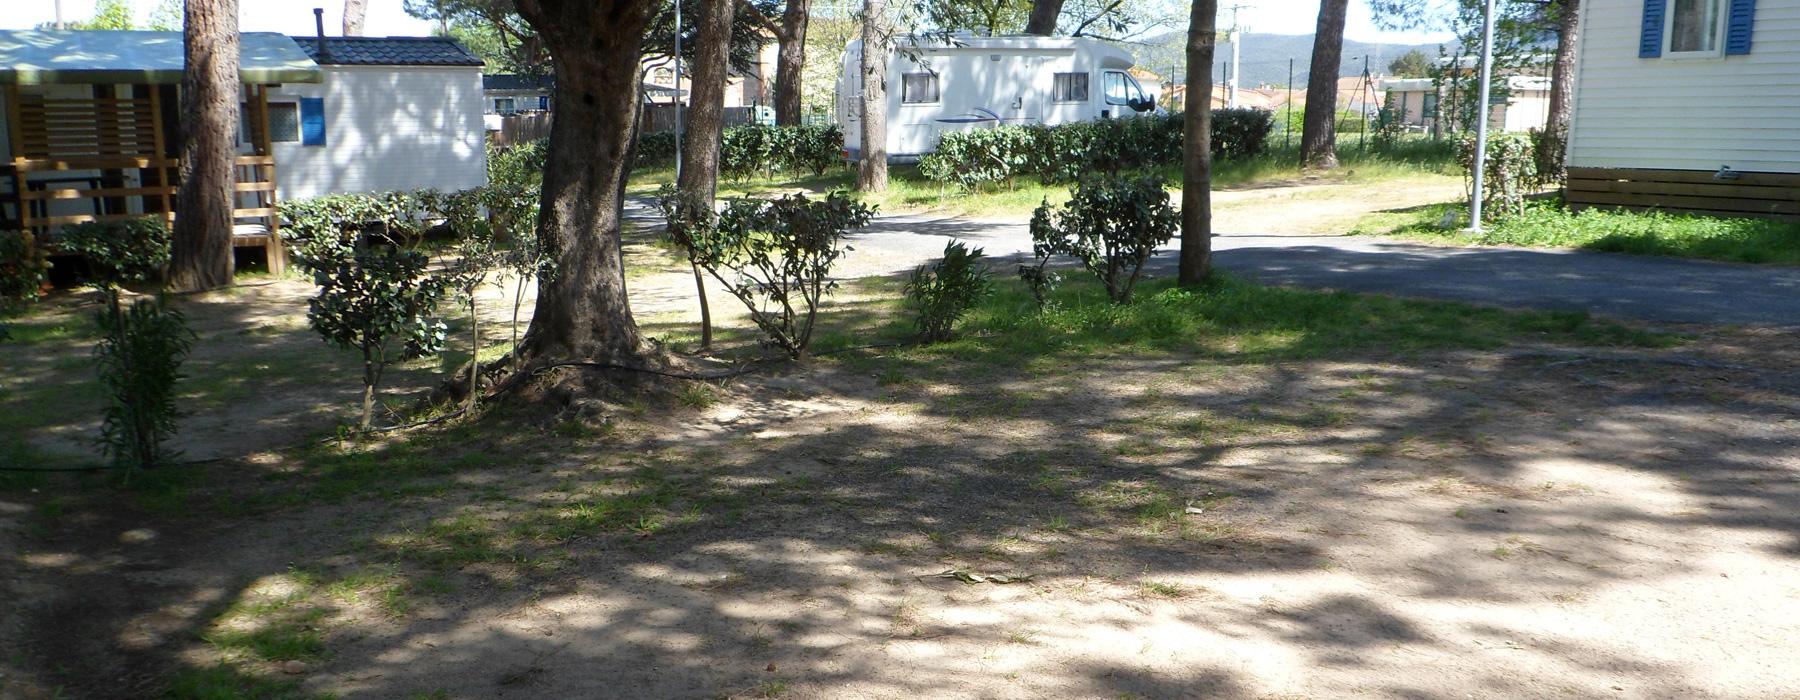 emplacement camping pr s du boulou camping les pins le congo pyr n es orientales. Black Bedroom Furniture Sets. Home Design Ideas